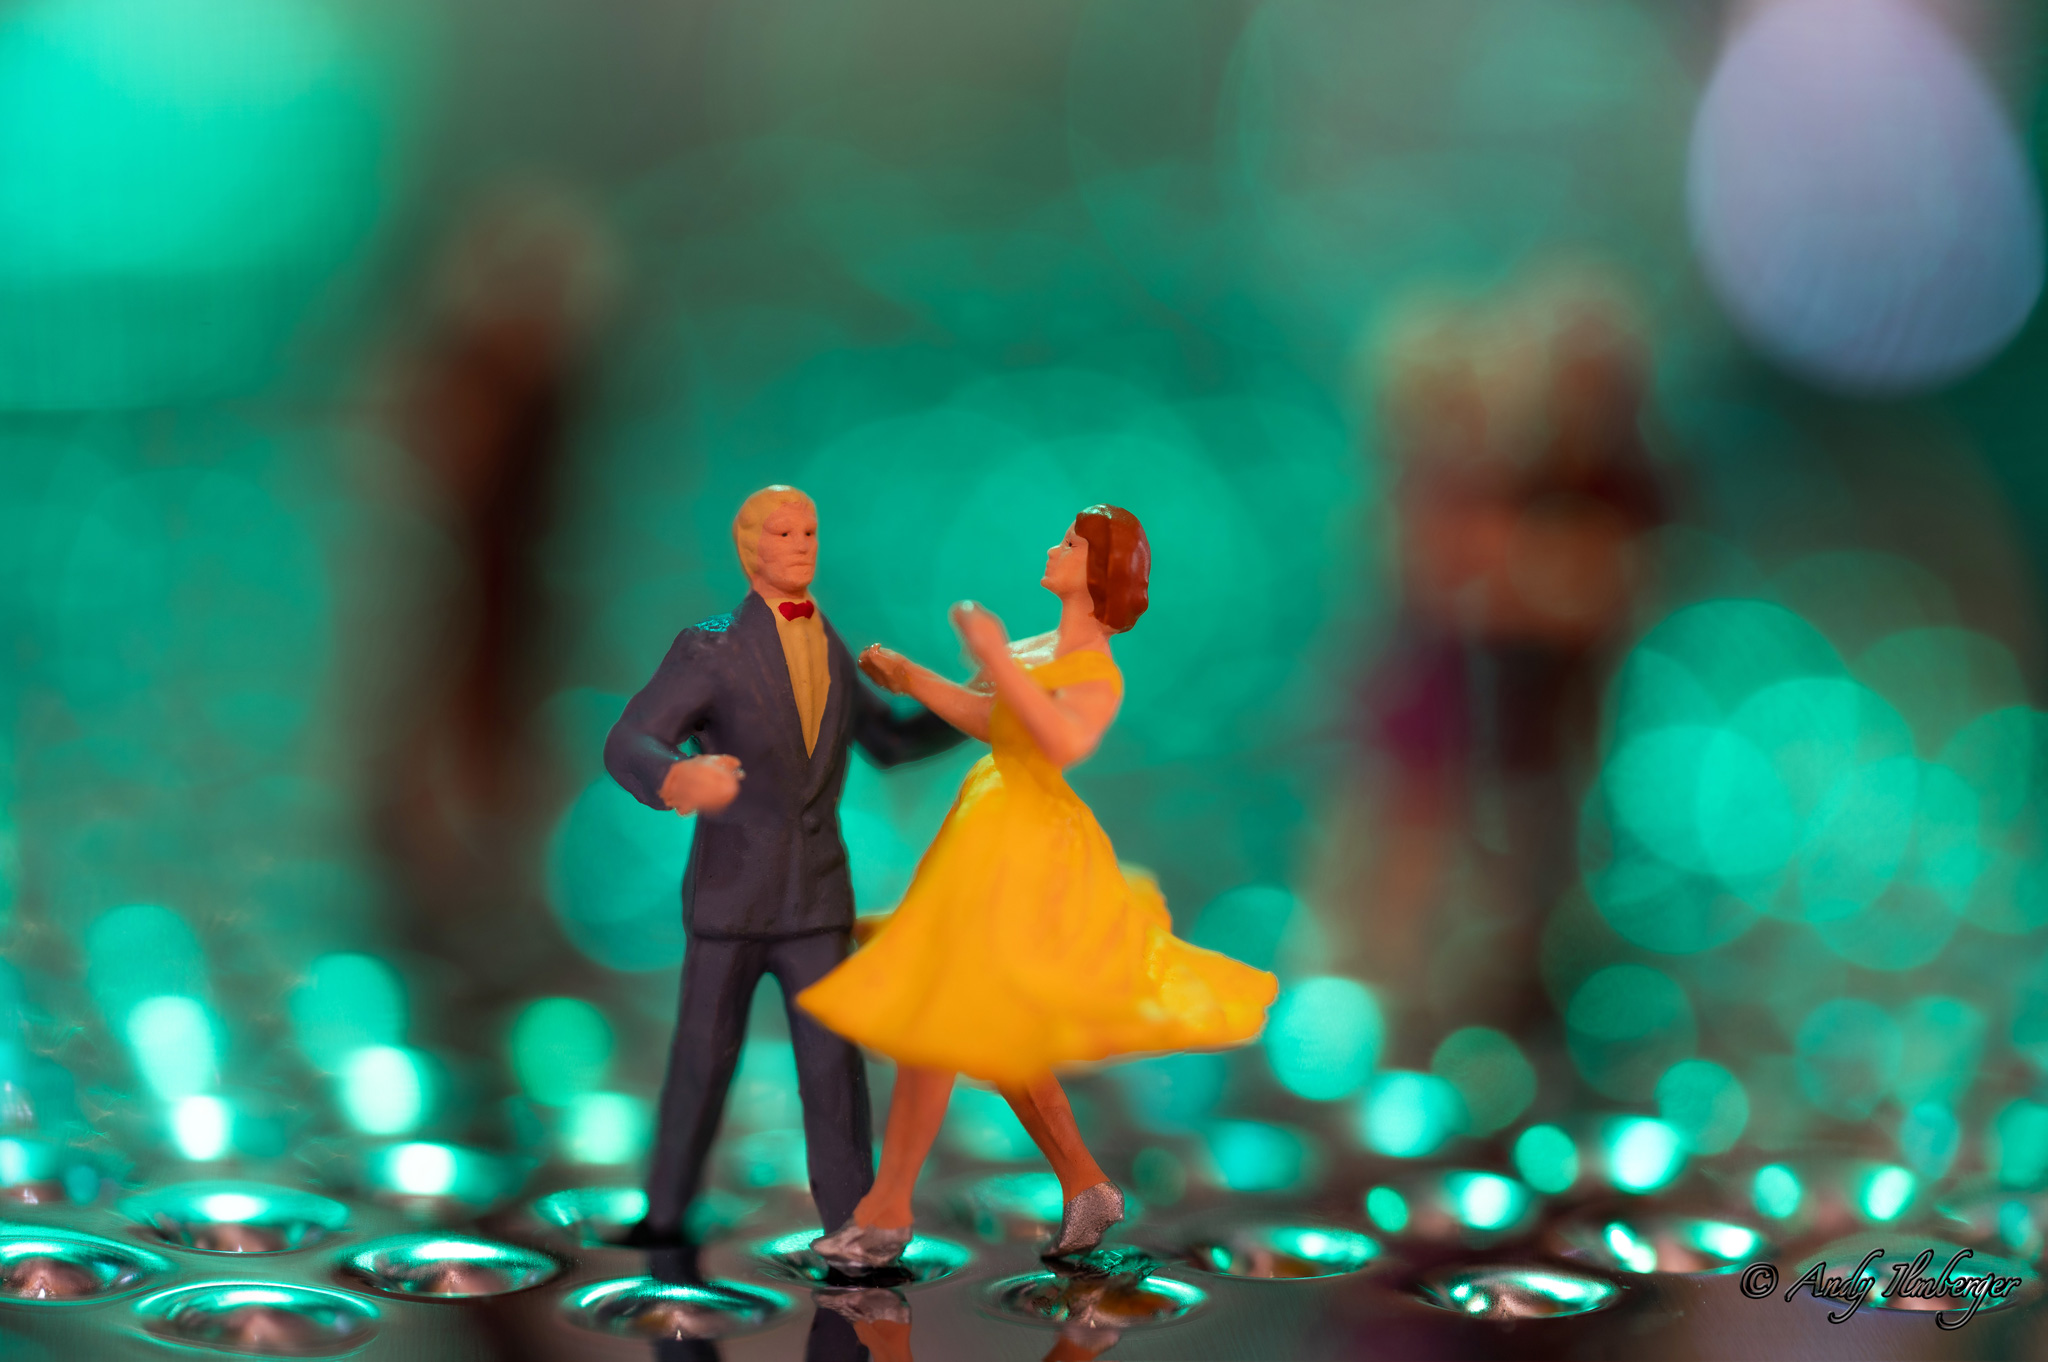 H0-Helden - Ballroom-Dancing - H0-Figuren in Szene gesetzt von © Andy Ilmberger im Kleine-Helden.Club